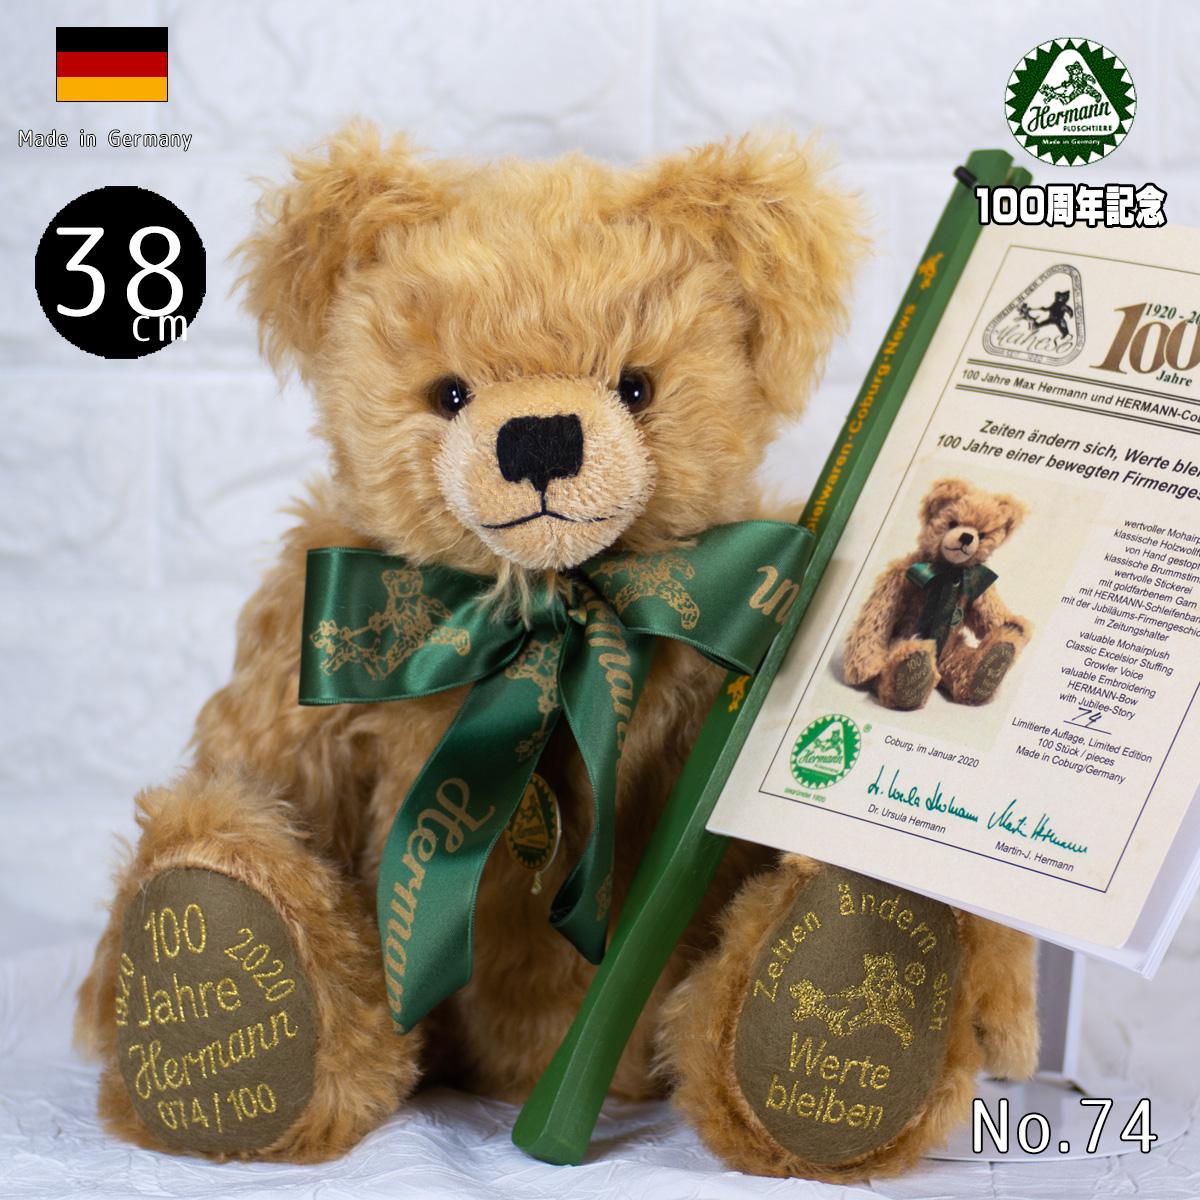 Hermann-Coburg 誕生100周年記念ベア 緑ハーマン社テディベア